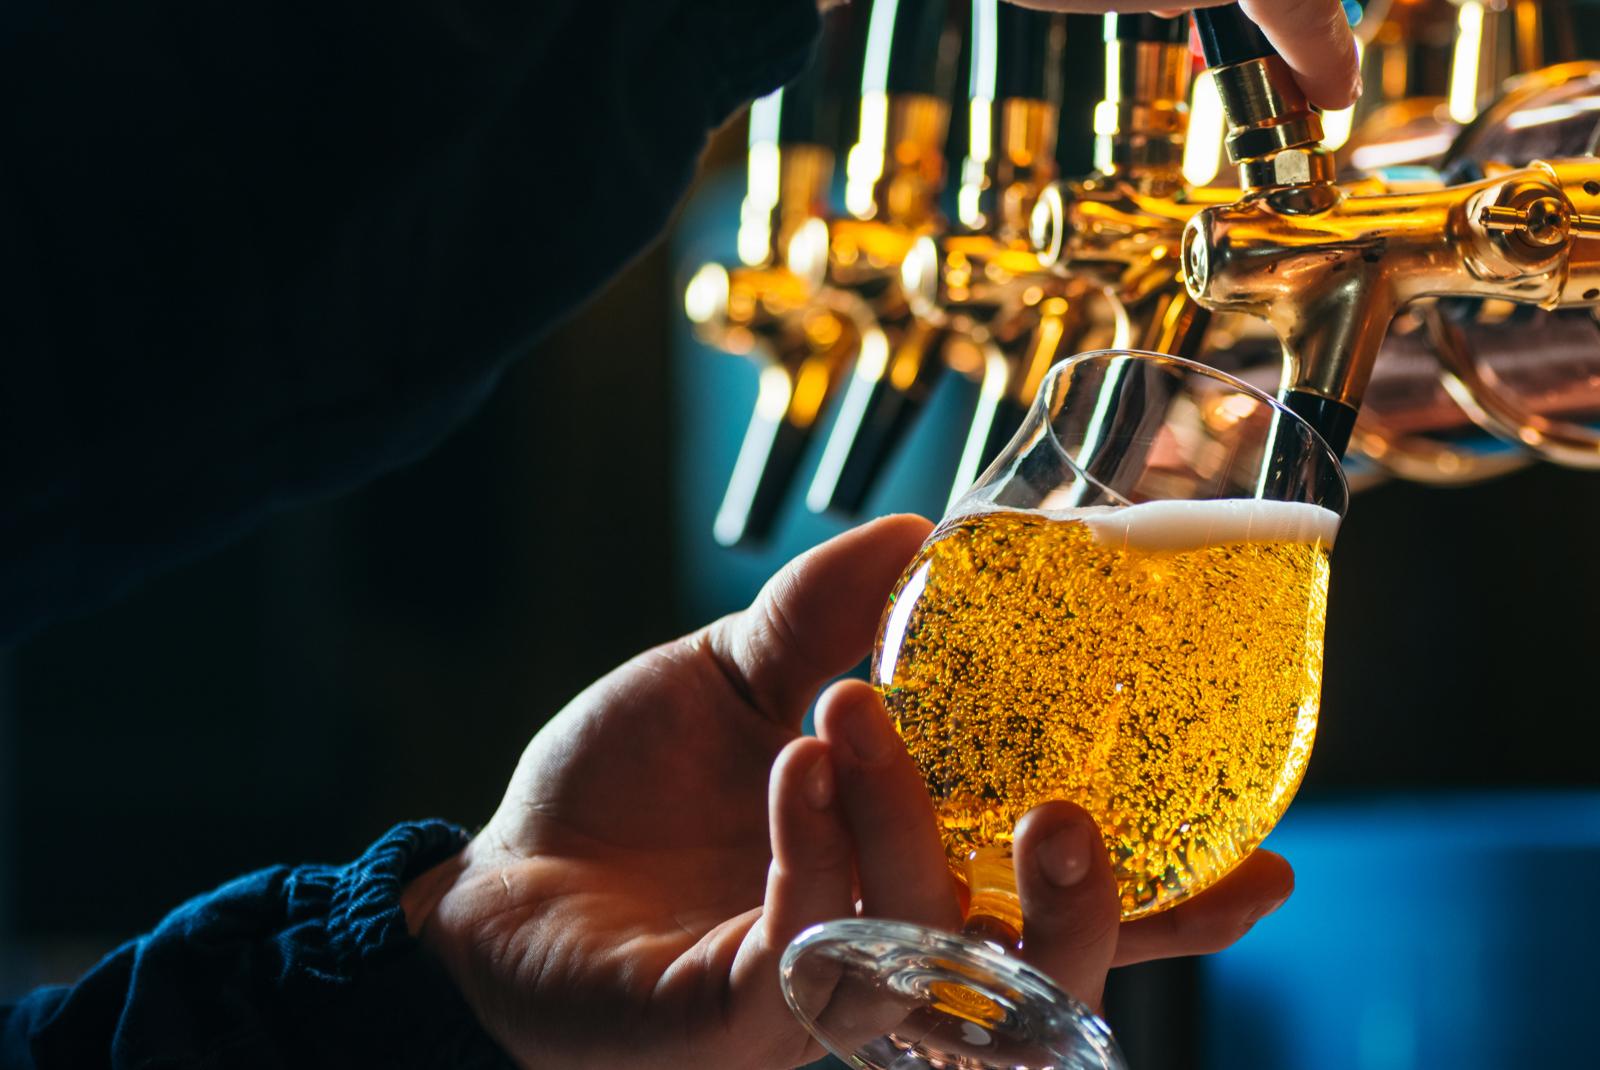 Evita desperdiciar cerveza en tu local